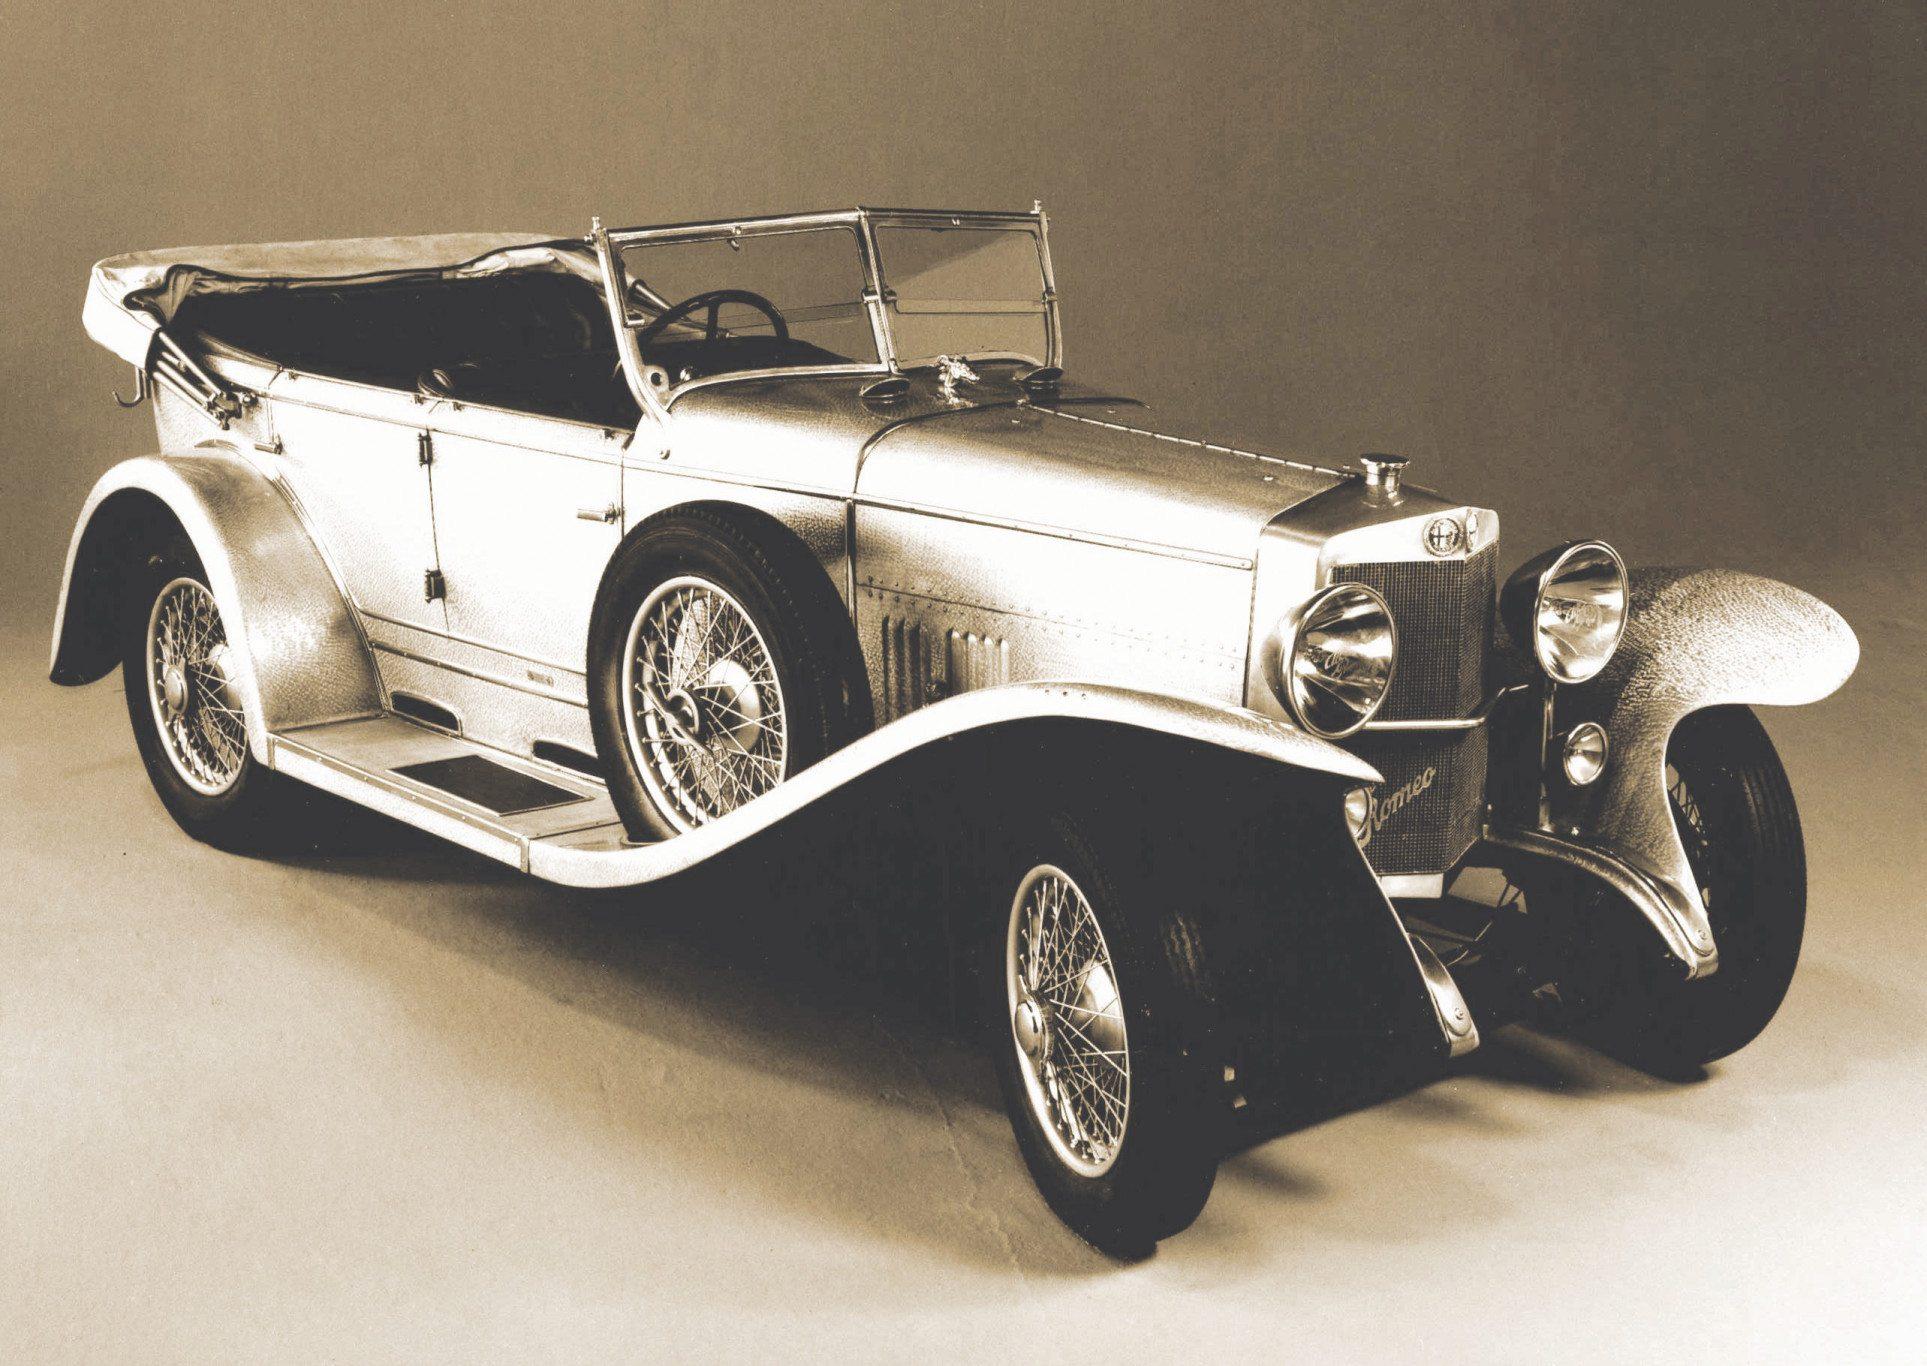 1925 Alfa Romeo Castagna RLSS